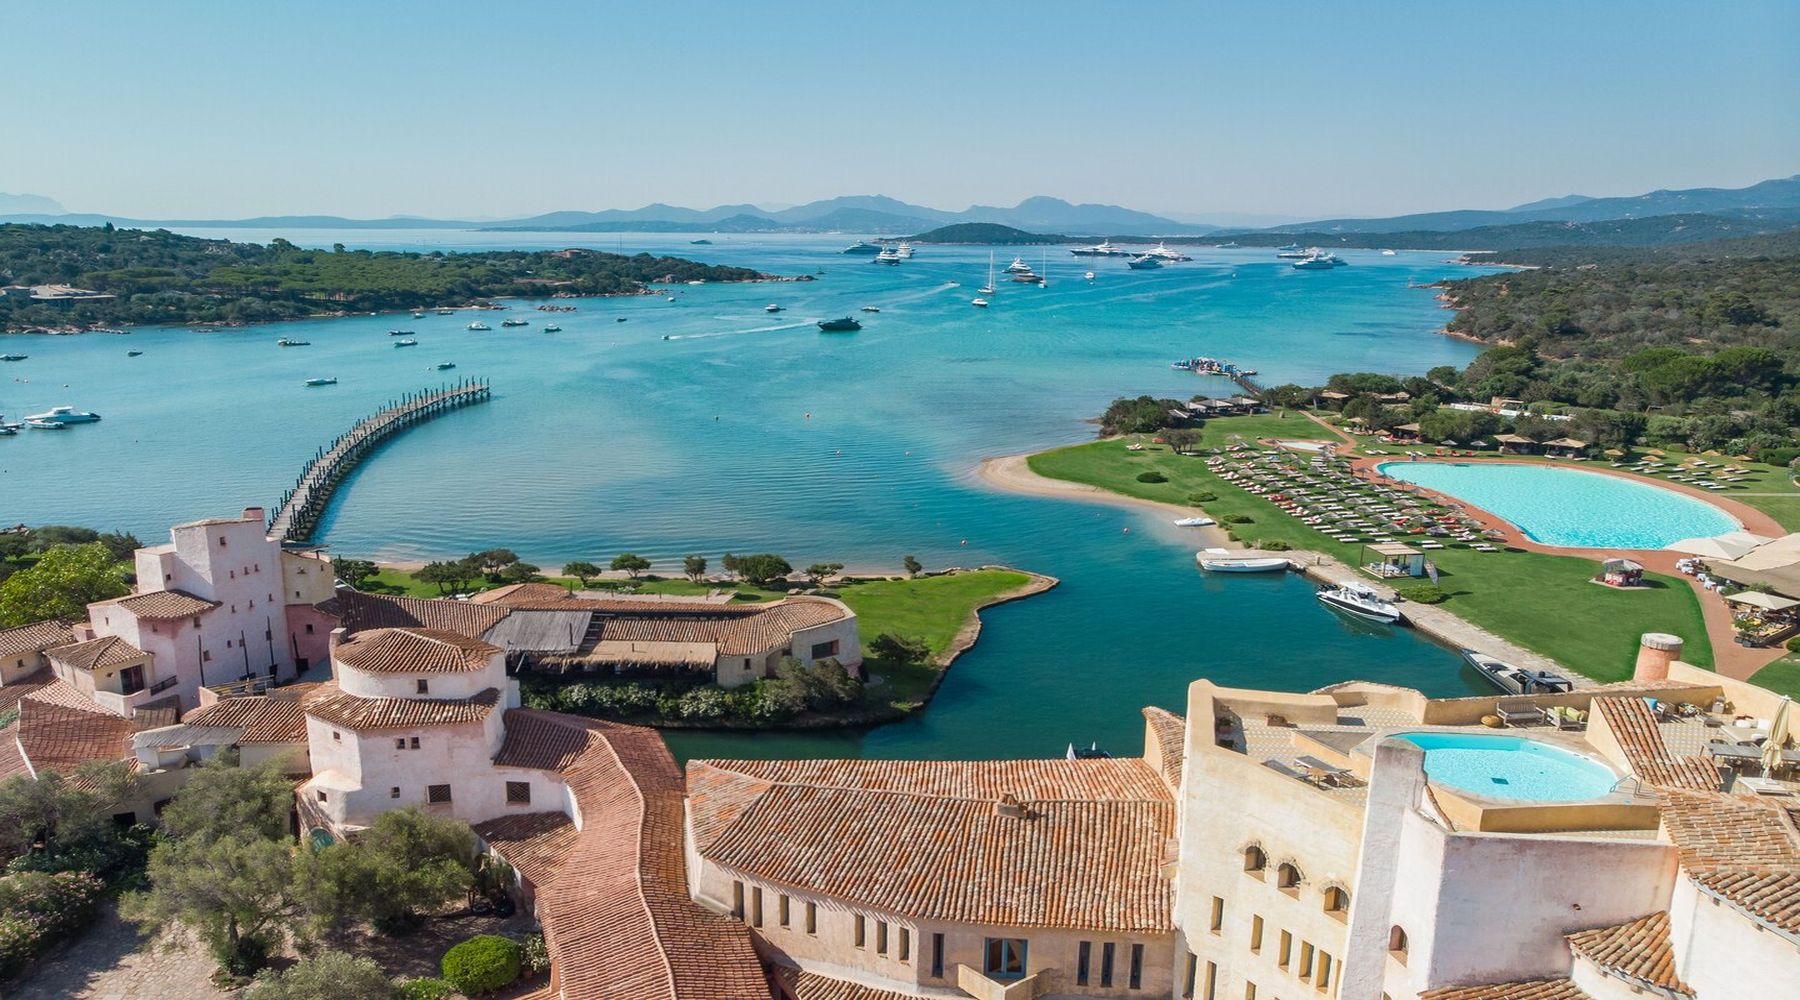 Cala di Volpe, a Luxury Collection Hotel, Costa Smeralda, Sardynia